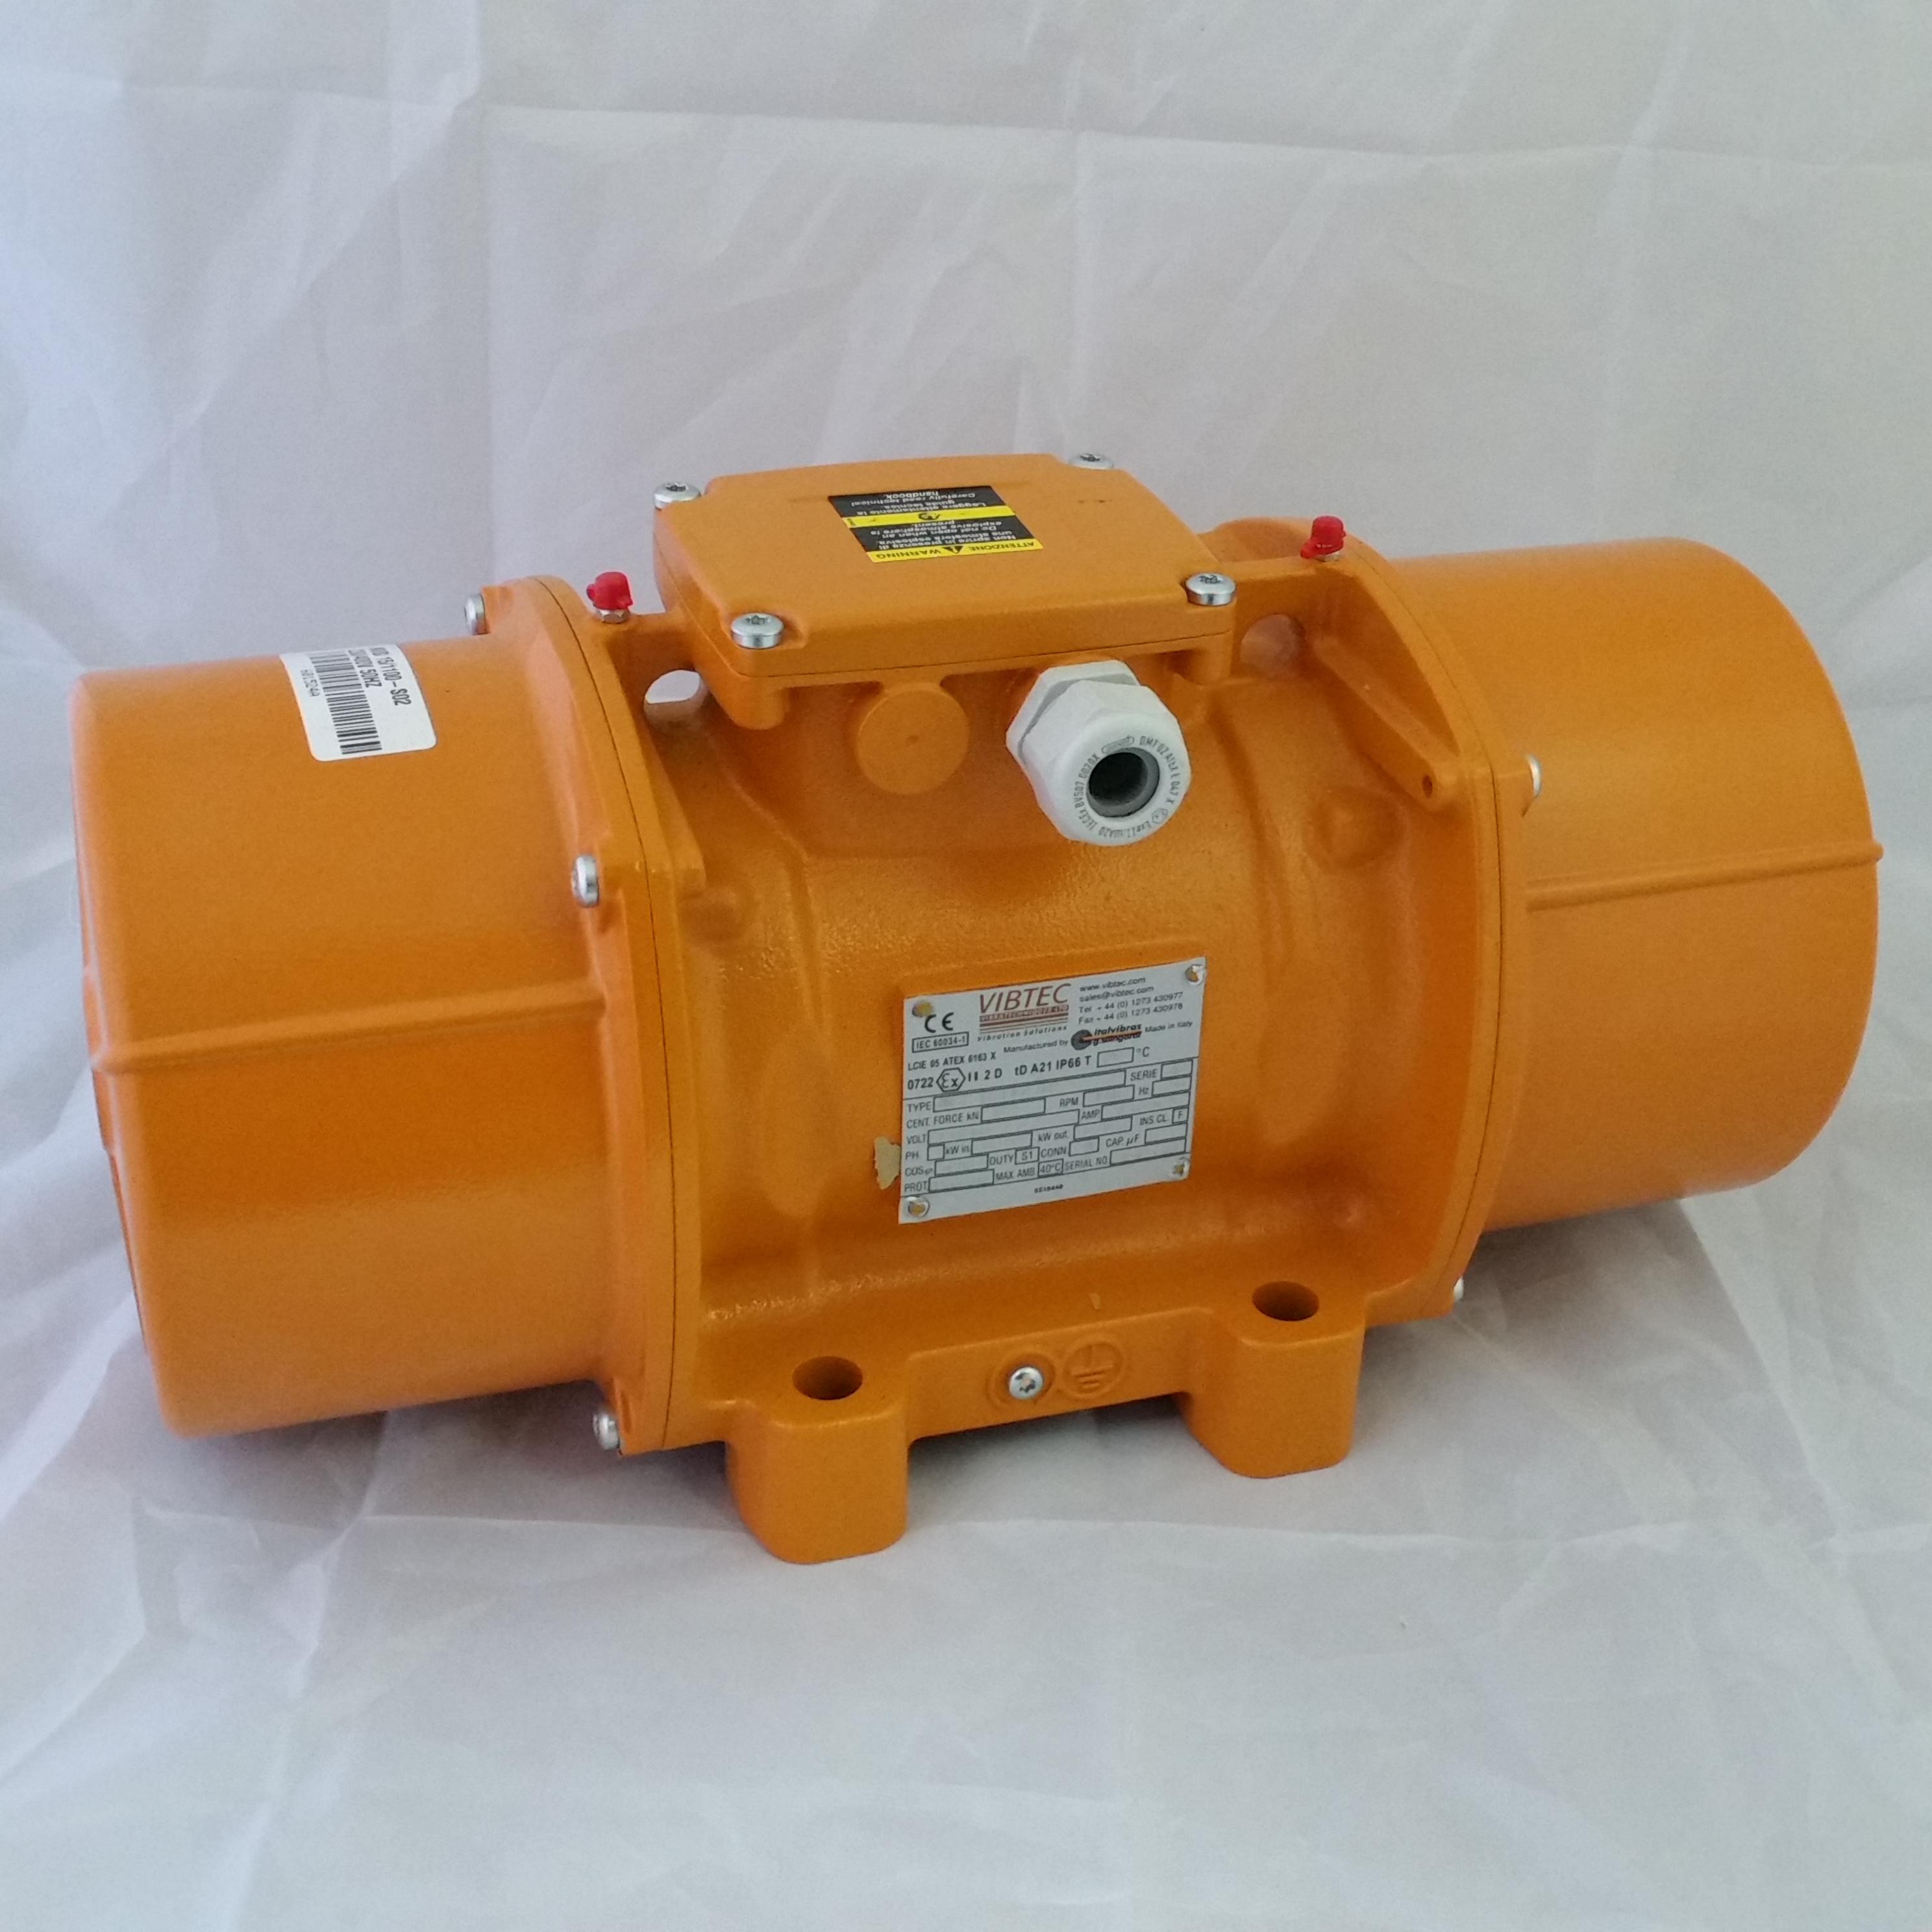 vibtec vibrator motor mvsi15  1100 s02 3 phase 0 55kw 1 phase motor wiring diagram